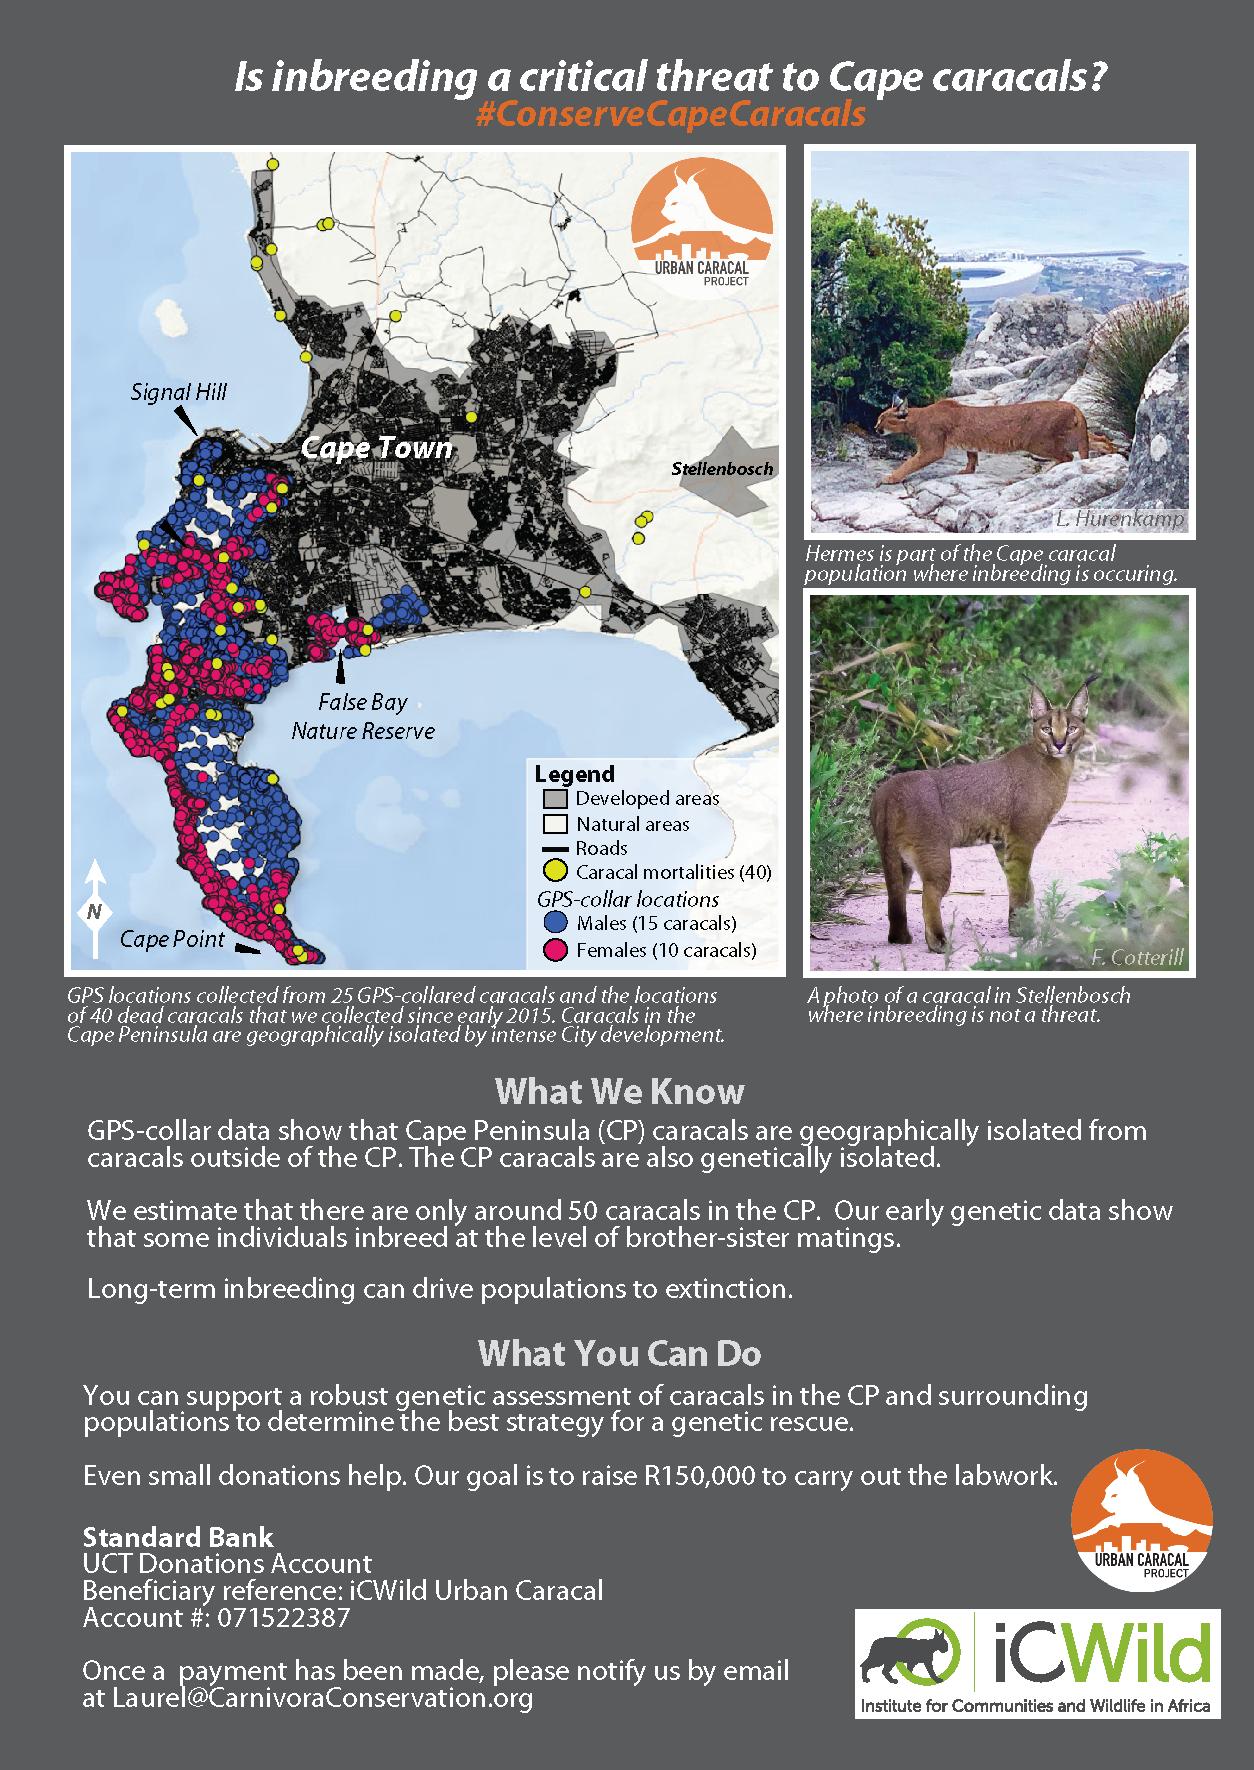 Is inbreeding a critical threat to Cape caracals? - April 19, 2019